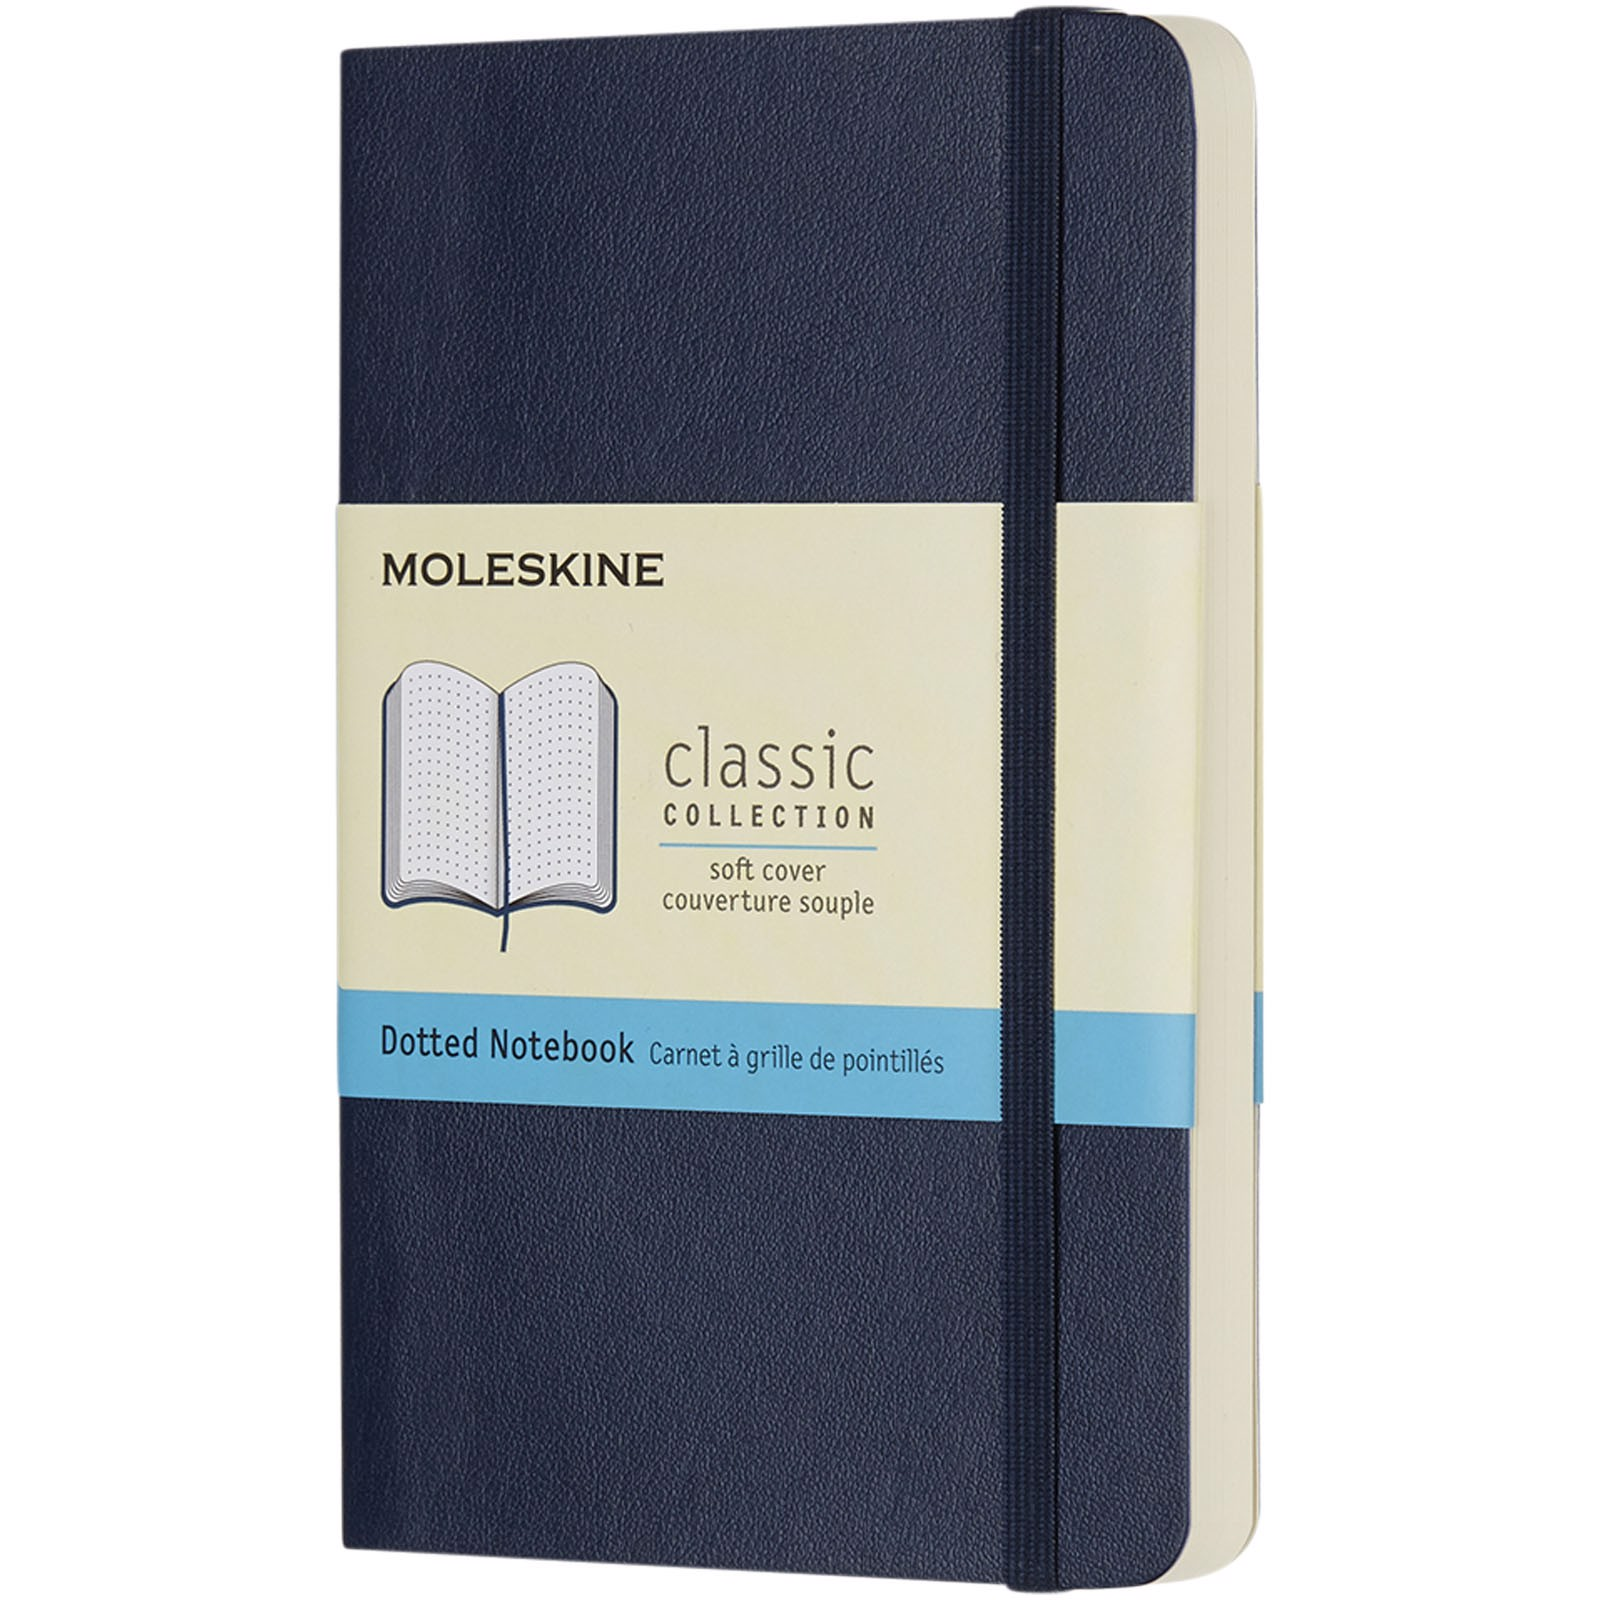 Classic Softcover Notizbuch Tachenformat – gepunktet - Saphir